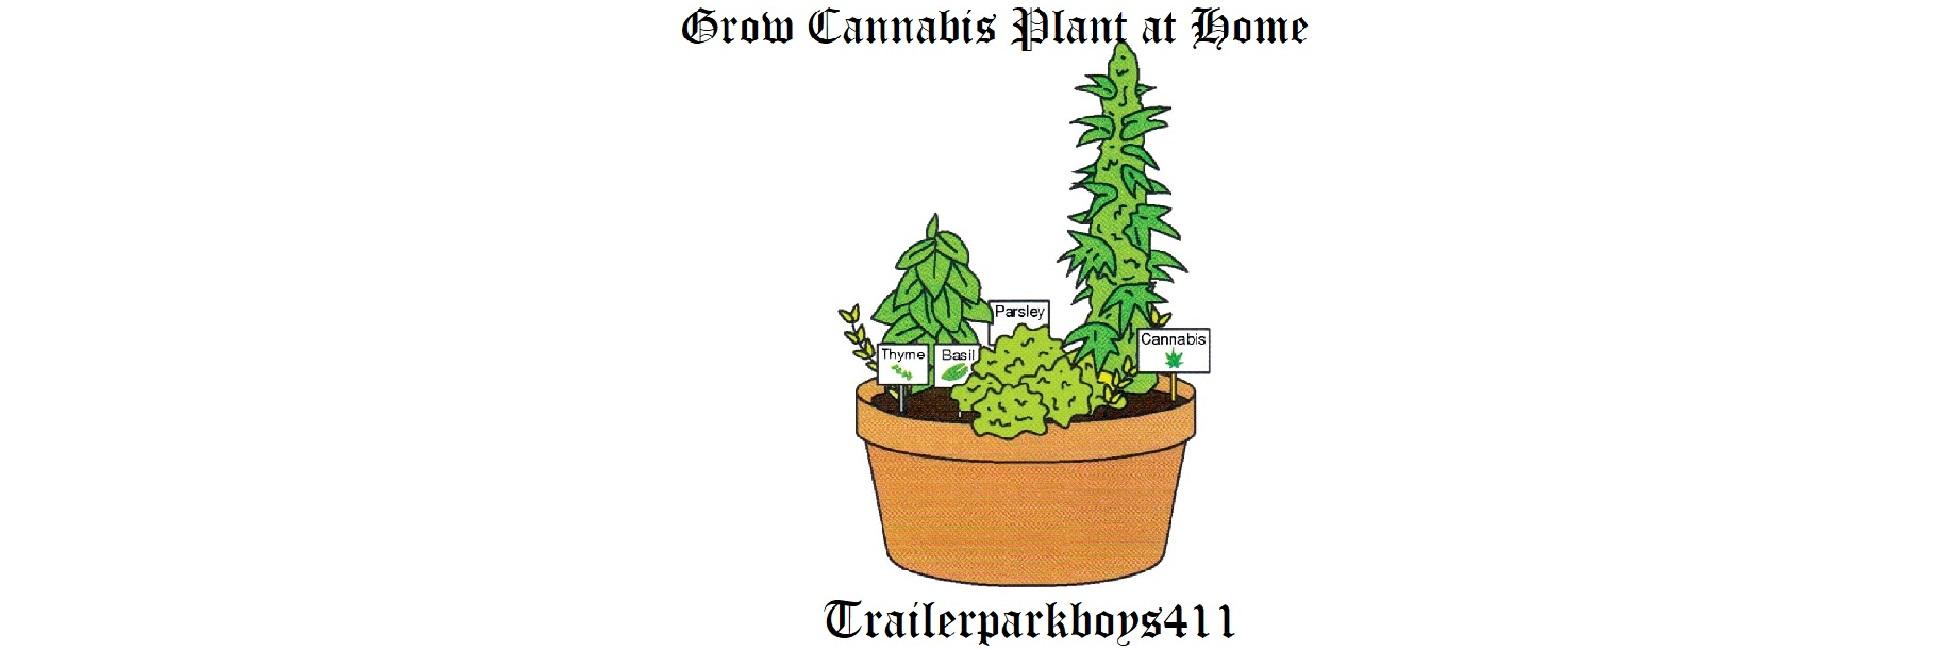 Grow Cannabis Plant at Home